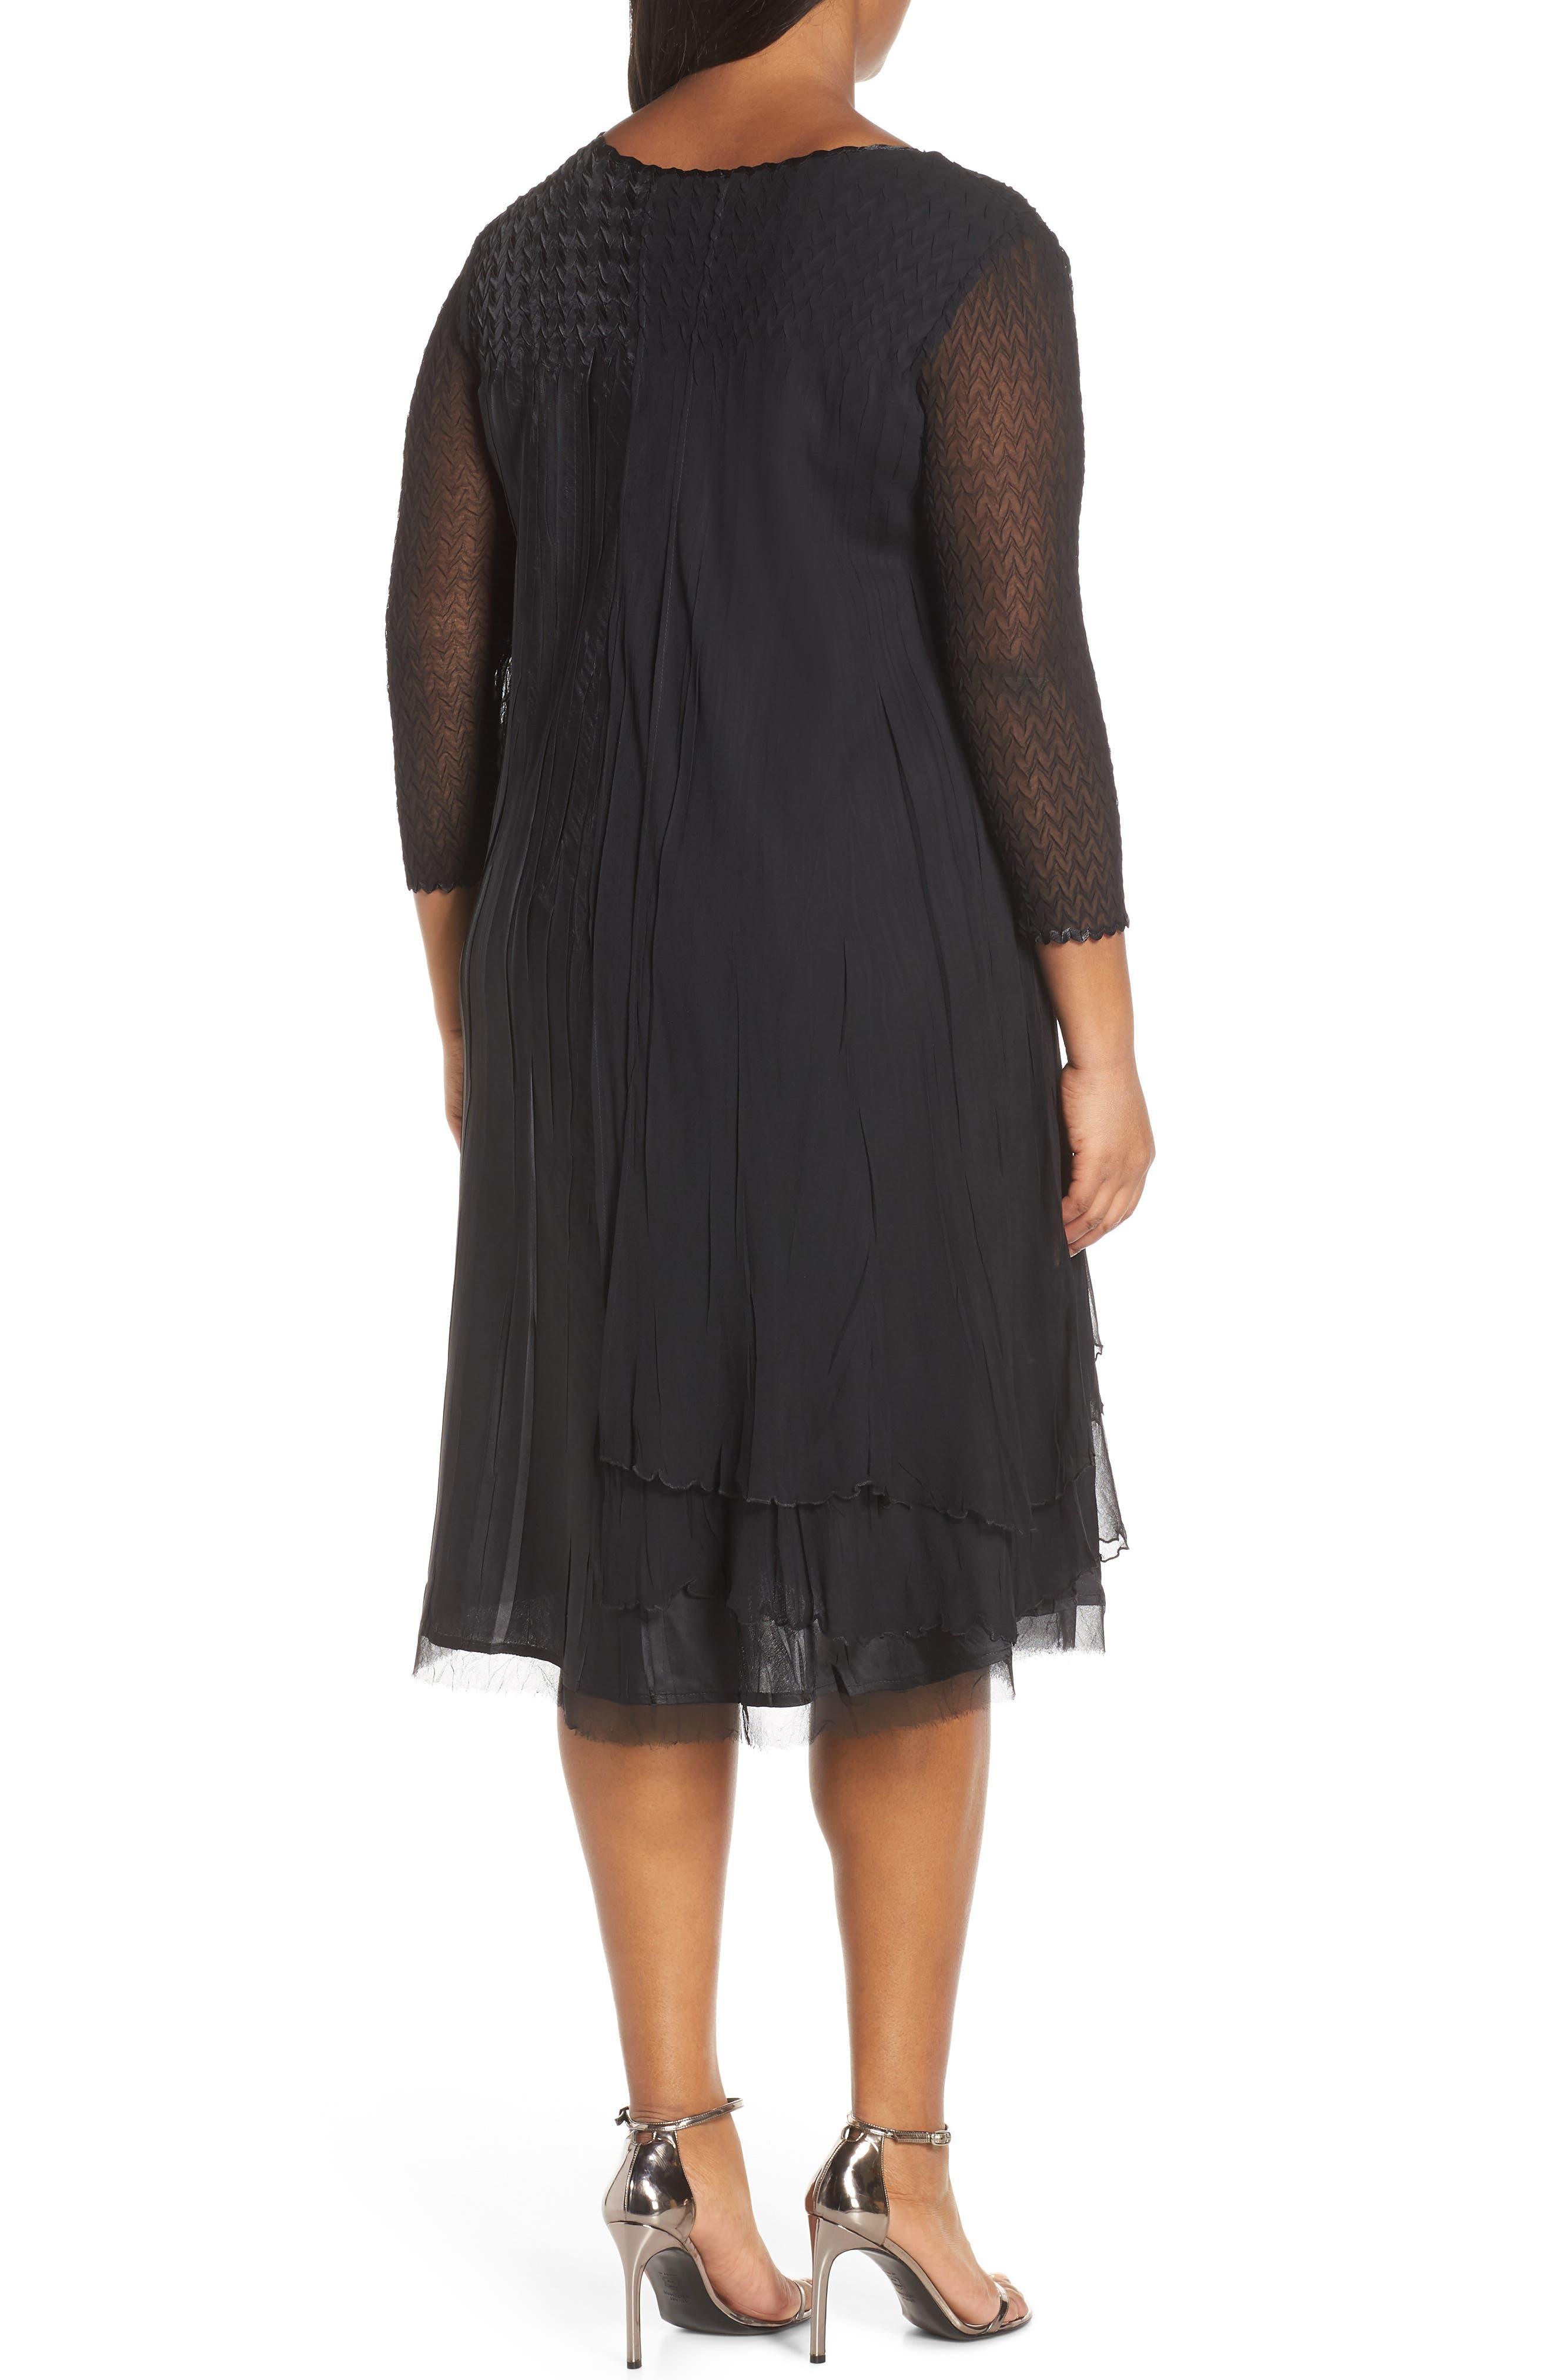 KOMAROV, Beaded Neck Chiffon Dress, Alternate thumbnail 2, color, 001